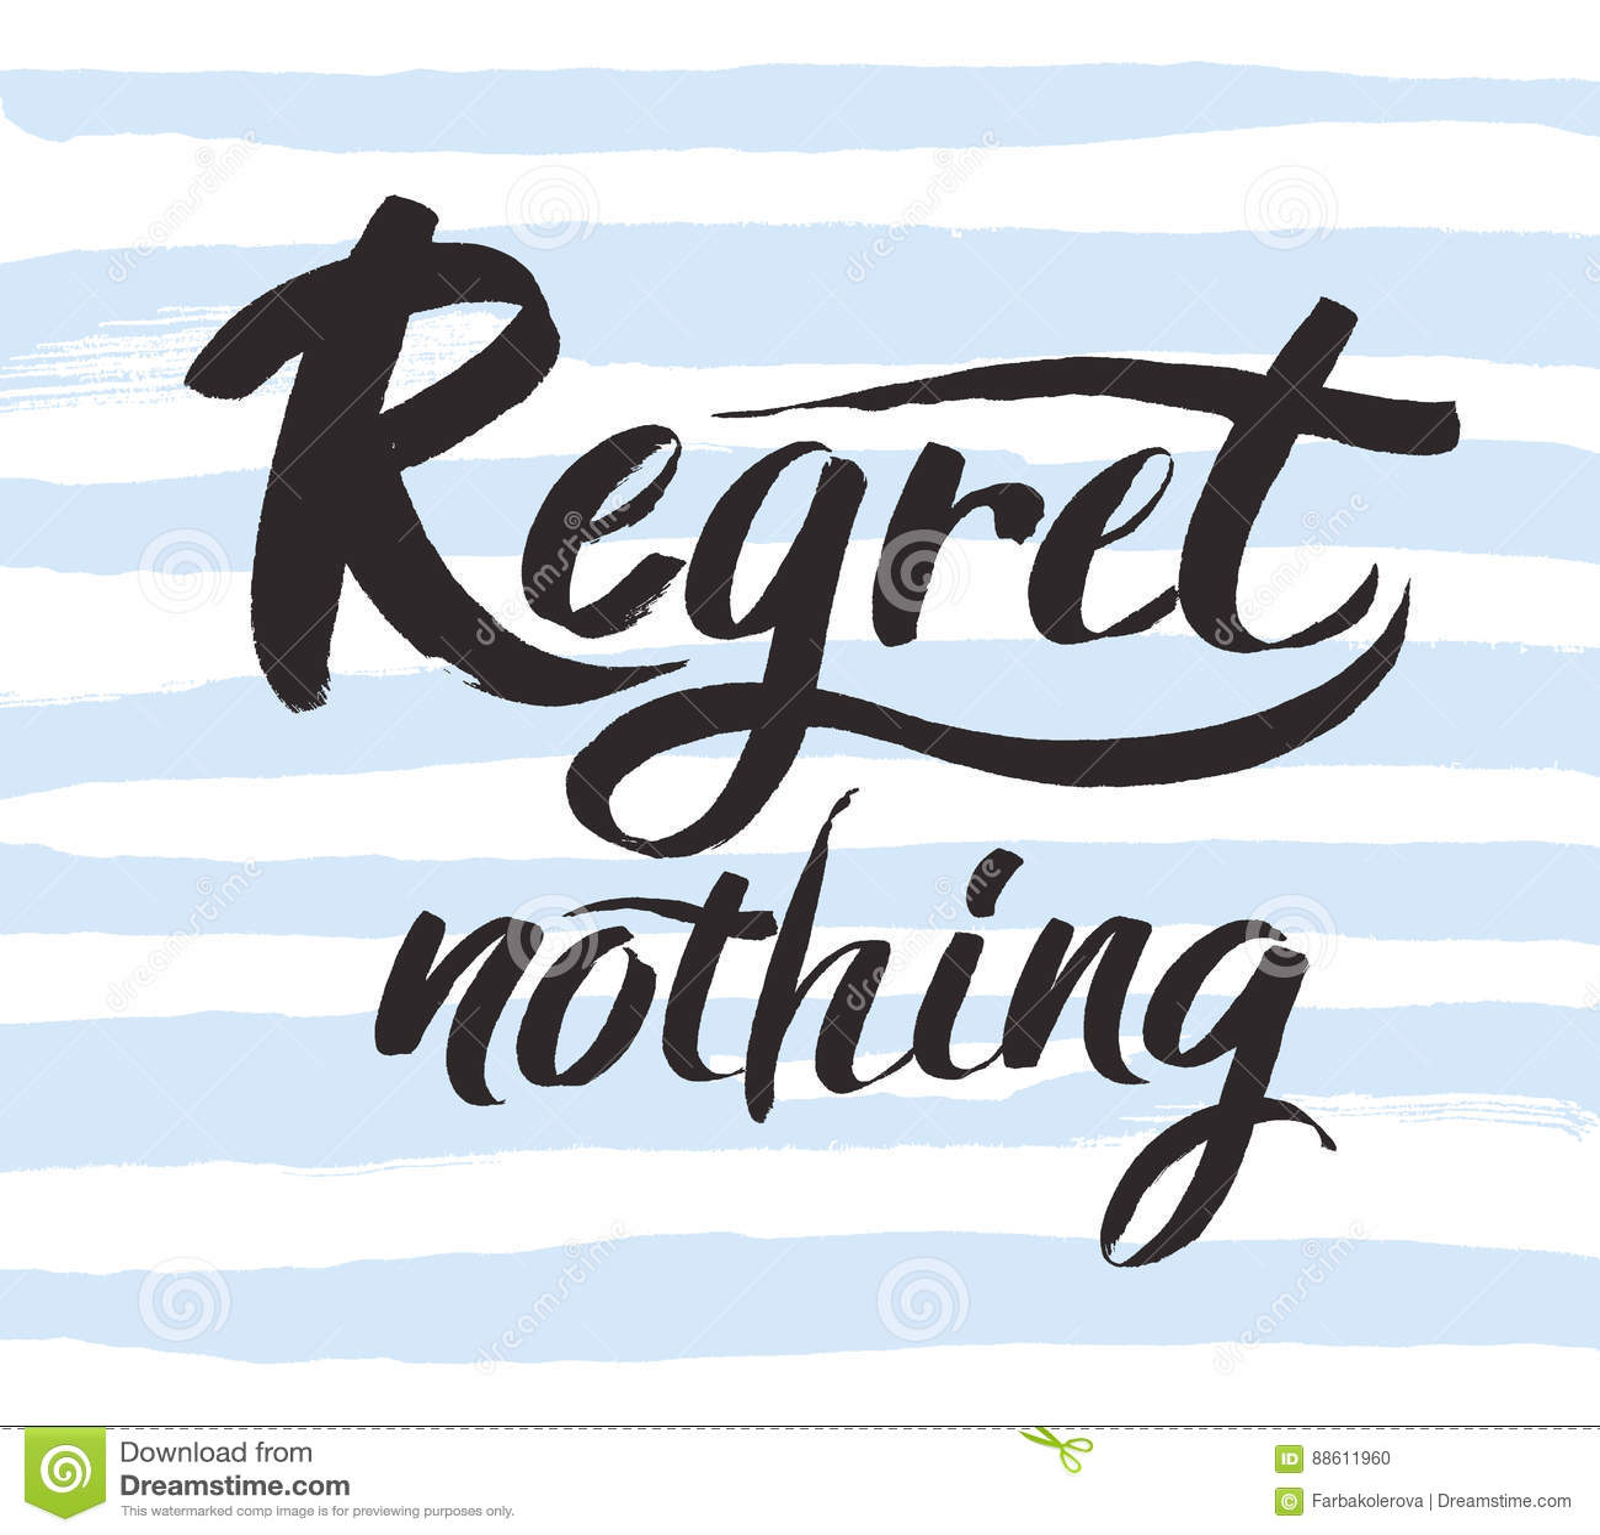 Inspirational Black Art : Regret nothing inspirational quote typography art